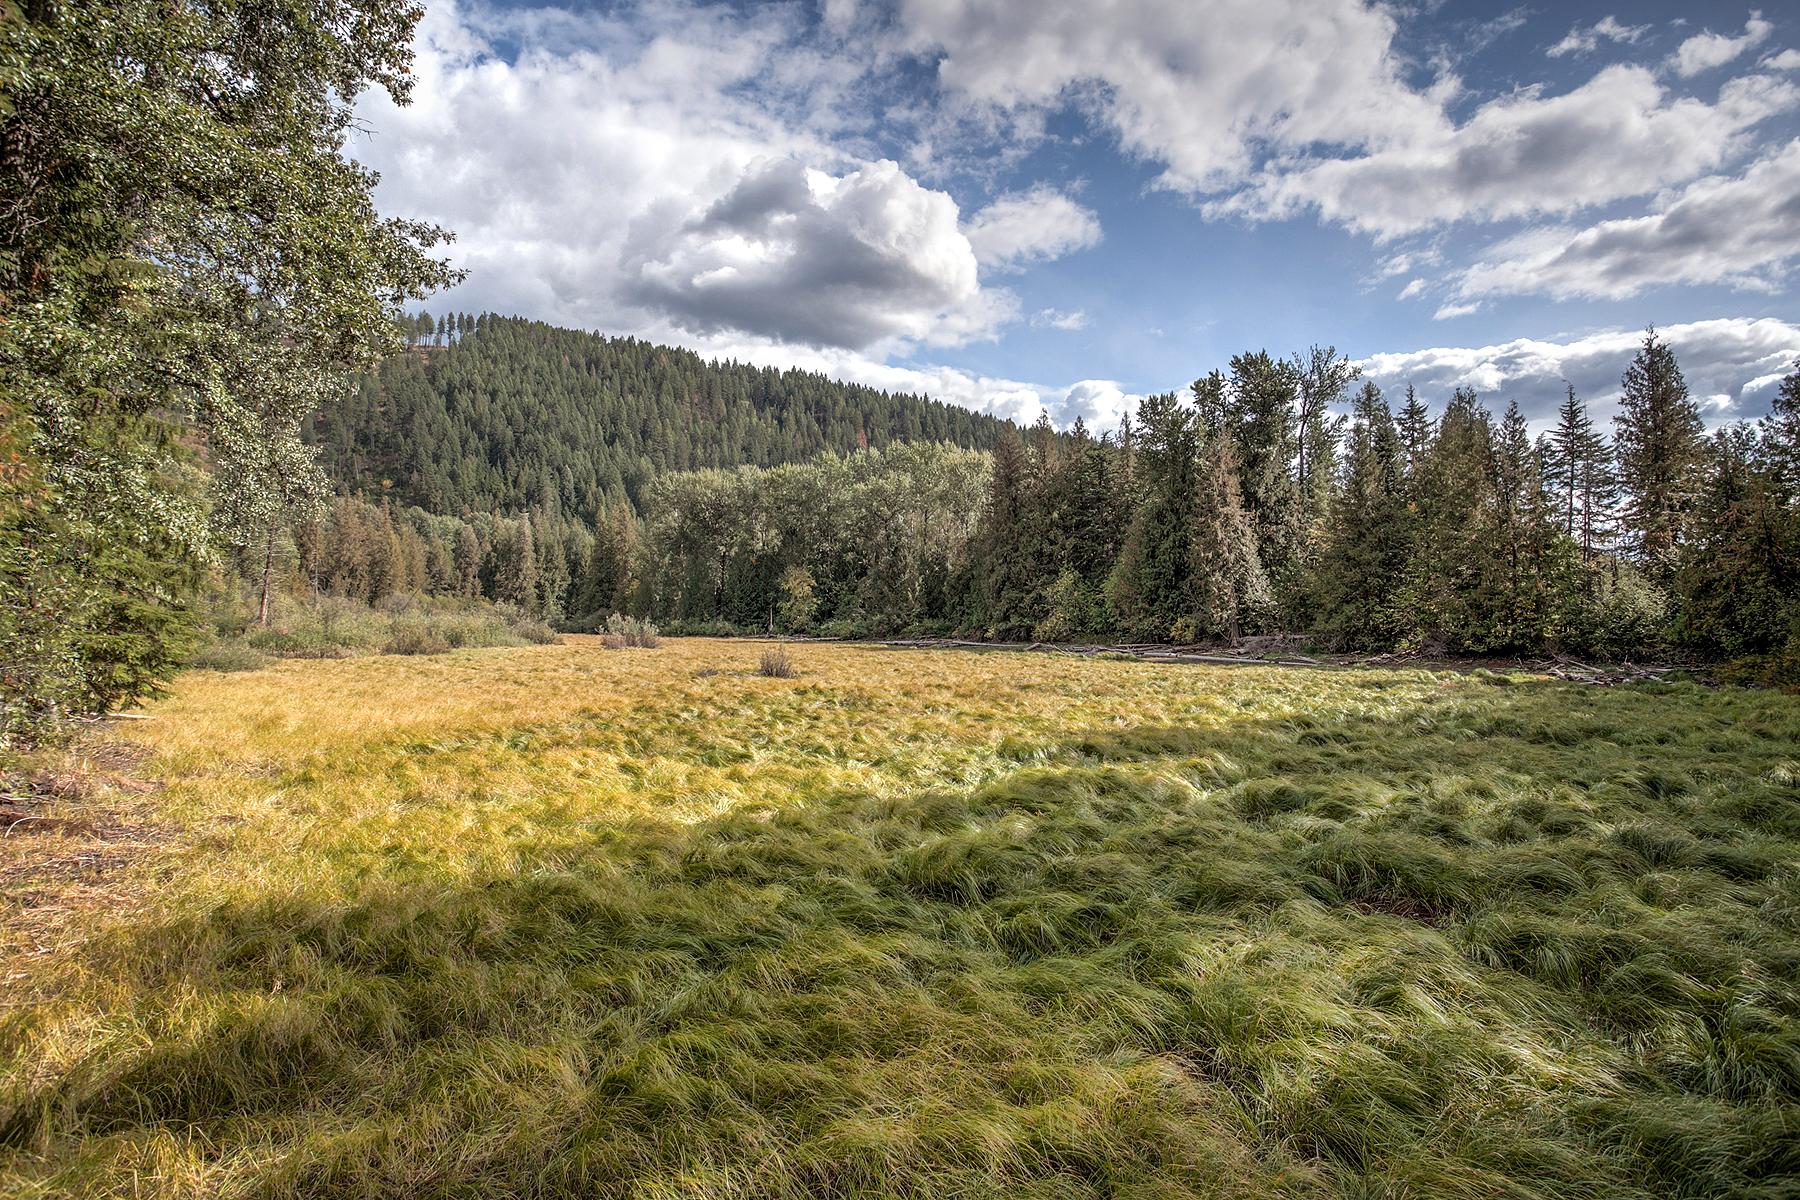 Land for Sale at BUSHWOOD ESTATES Lot 5 1585 Lost Creek Rd Coolin, Idaho 83821 United States